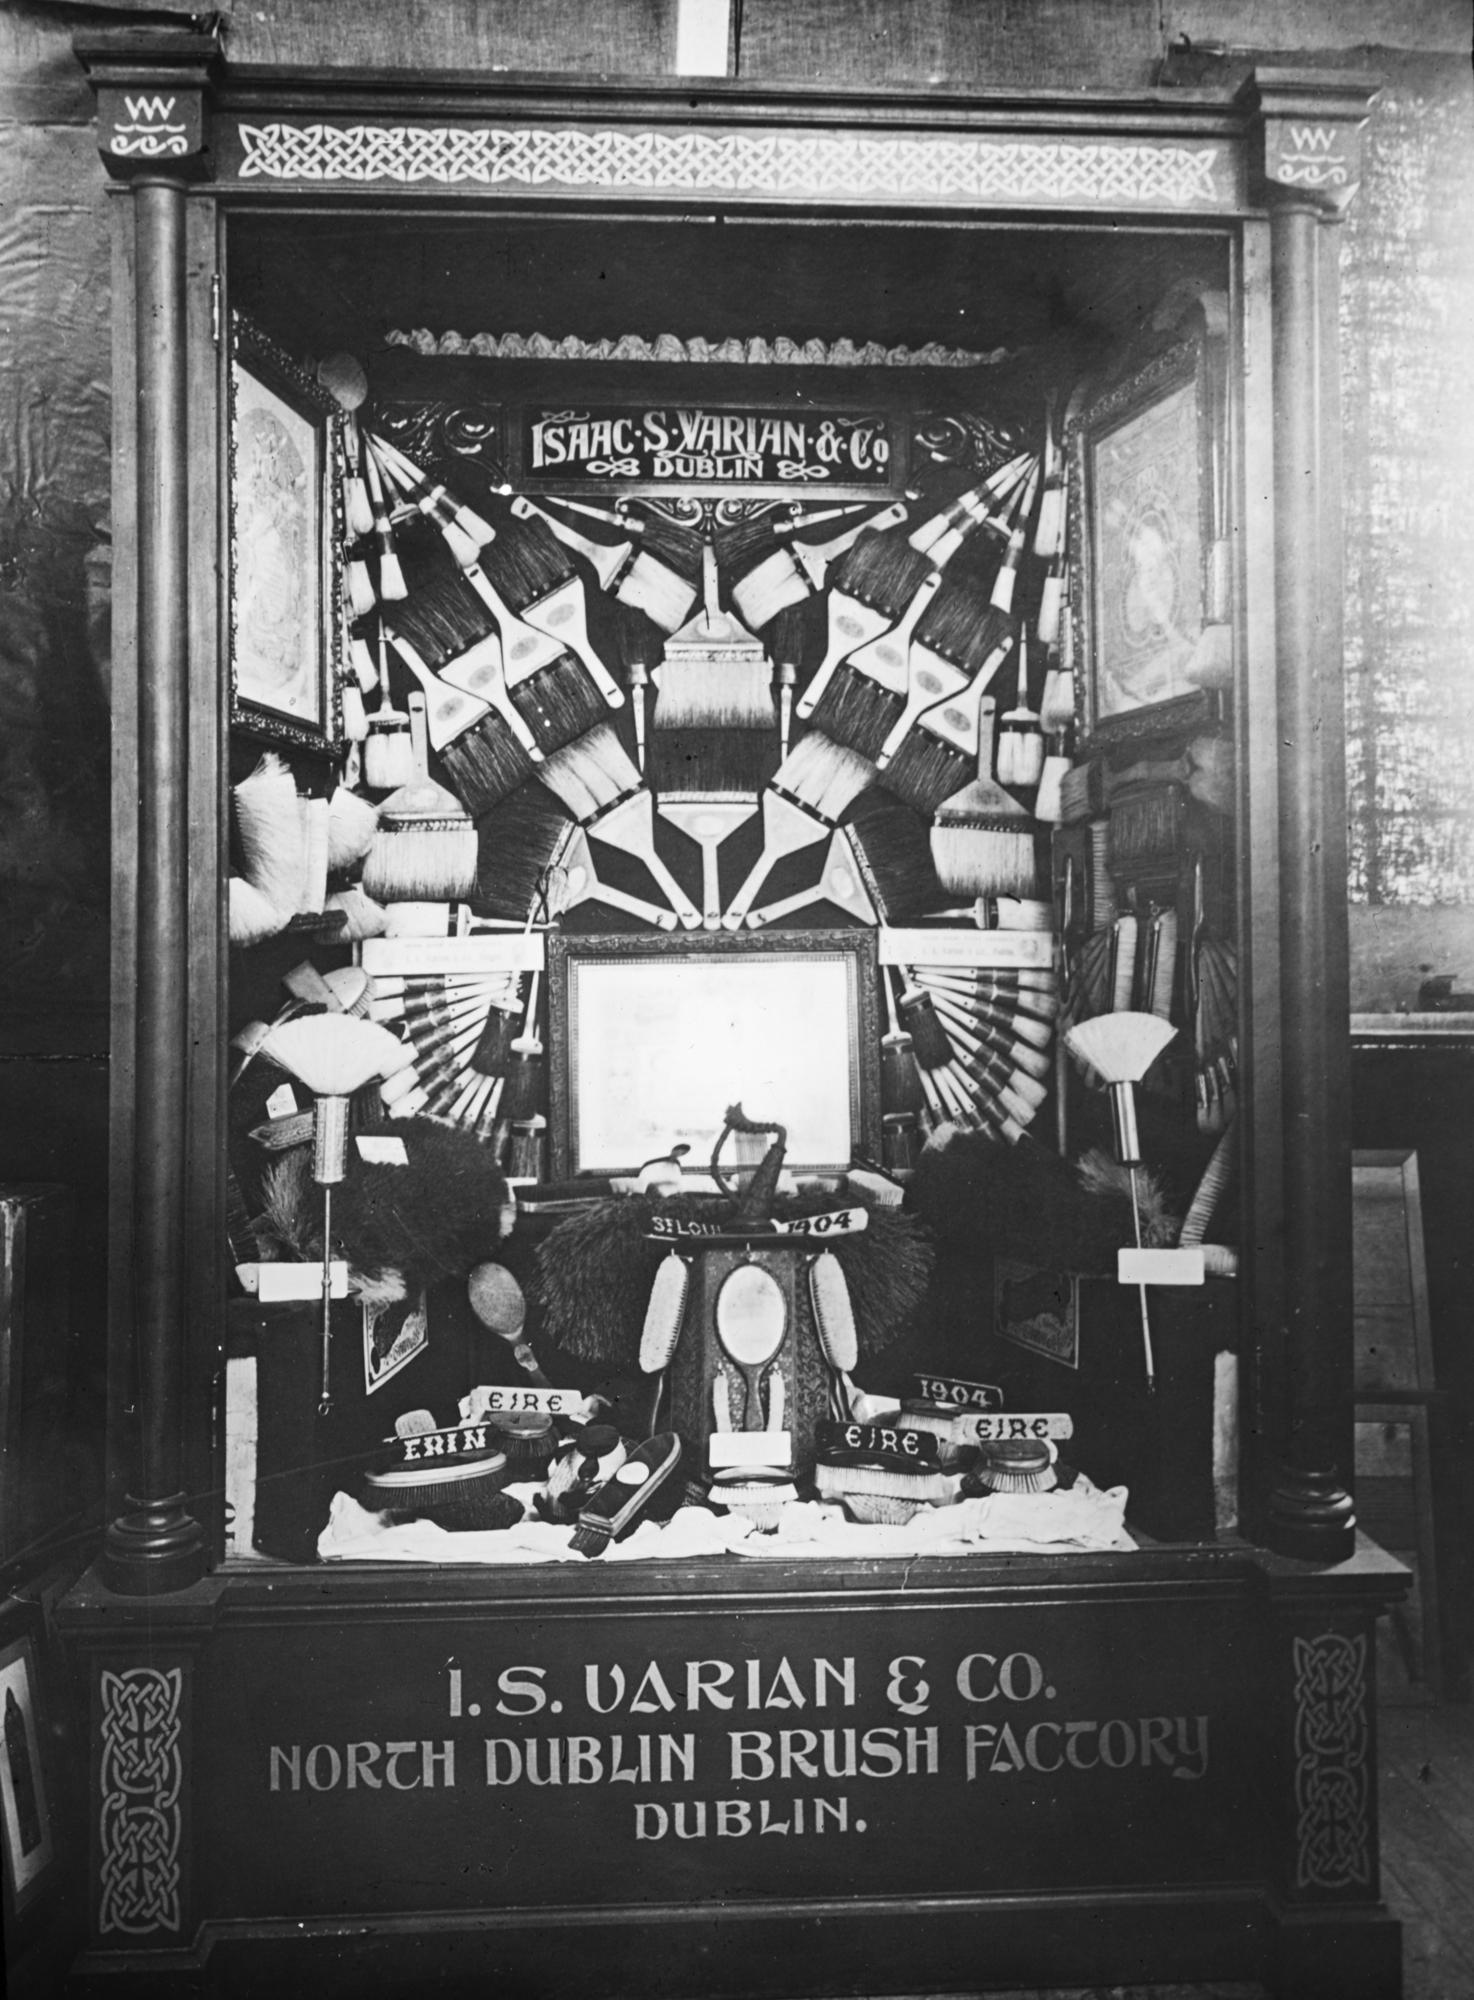 I.S. Varian & Co., brushmakers. North Dublin